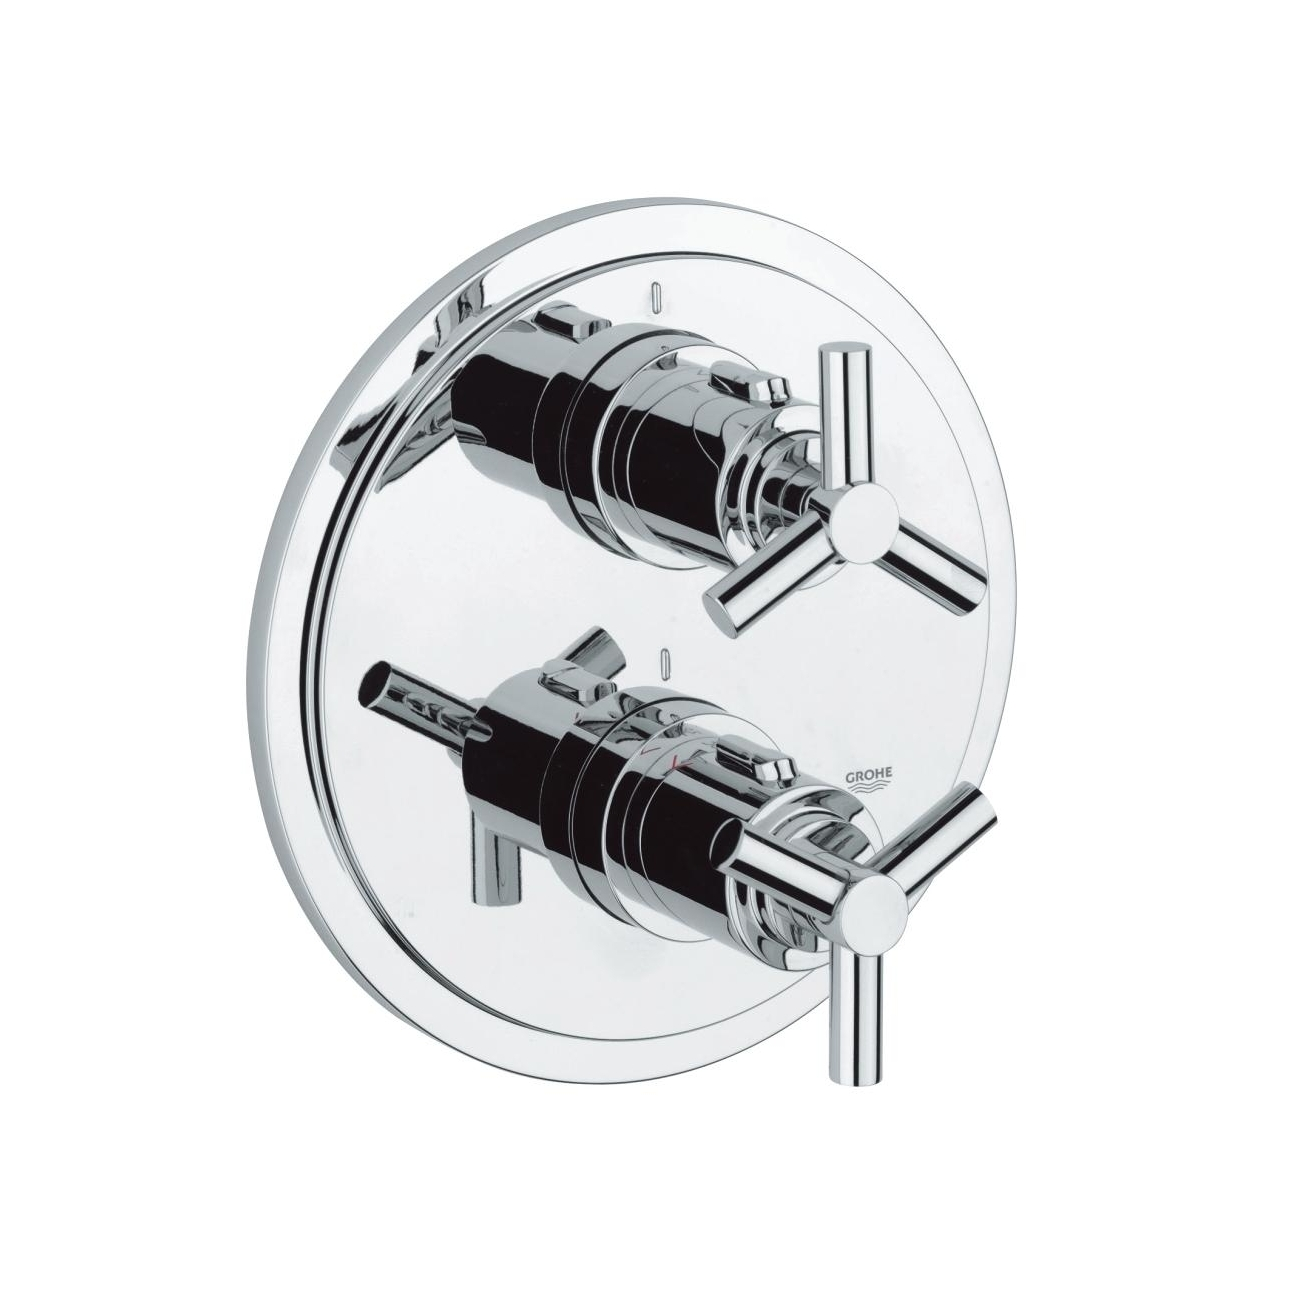 GROHE ATRIO Y Thermostatic shower mixer